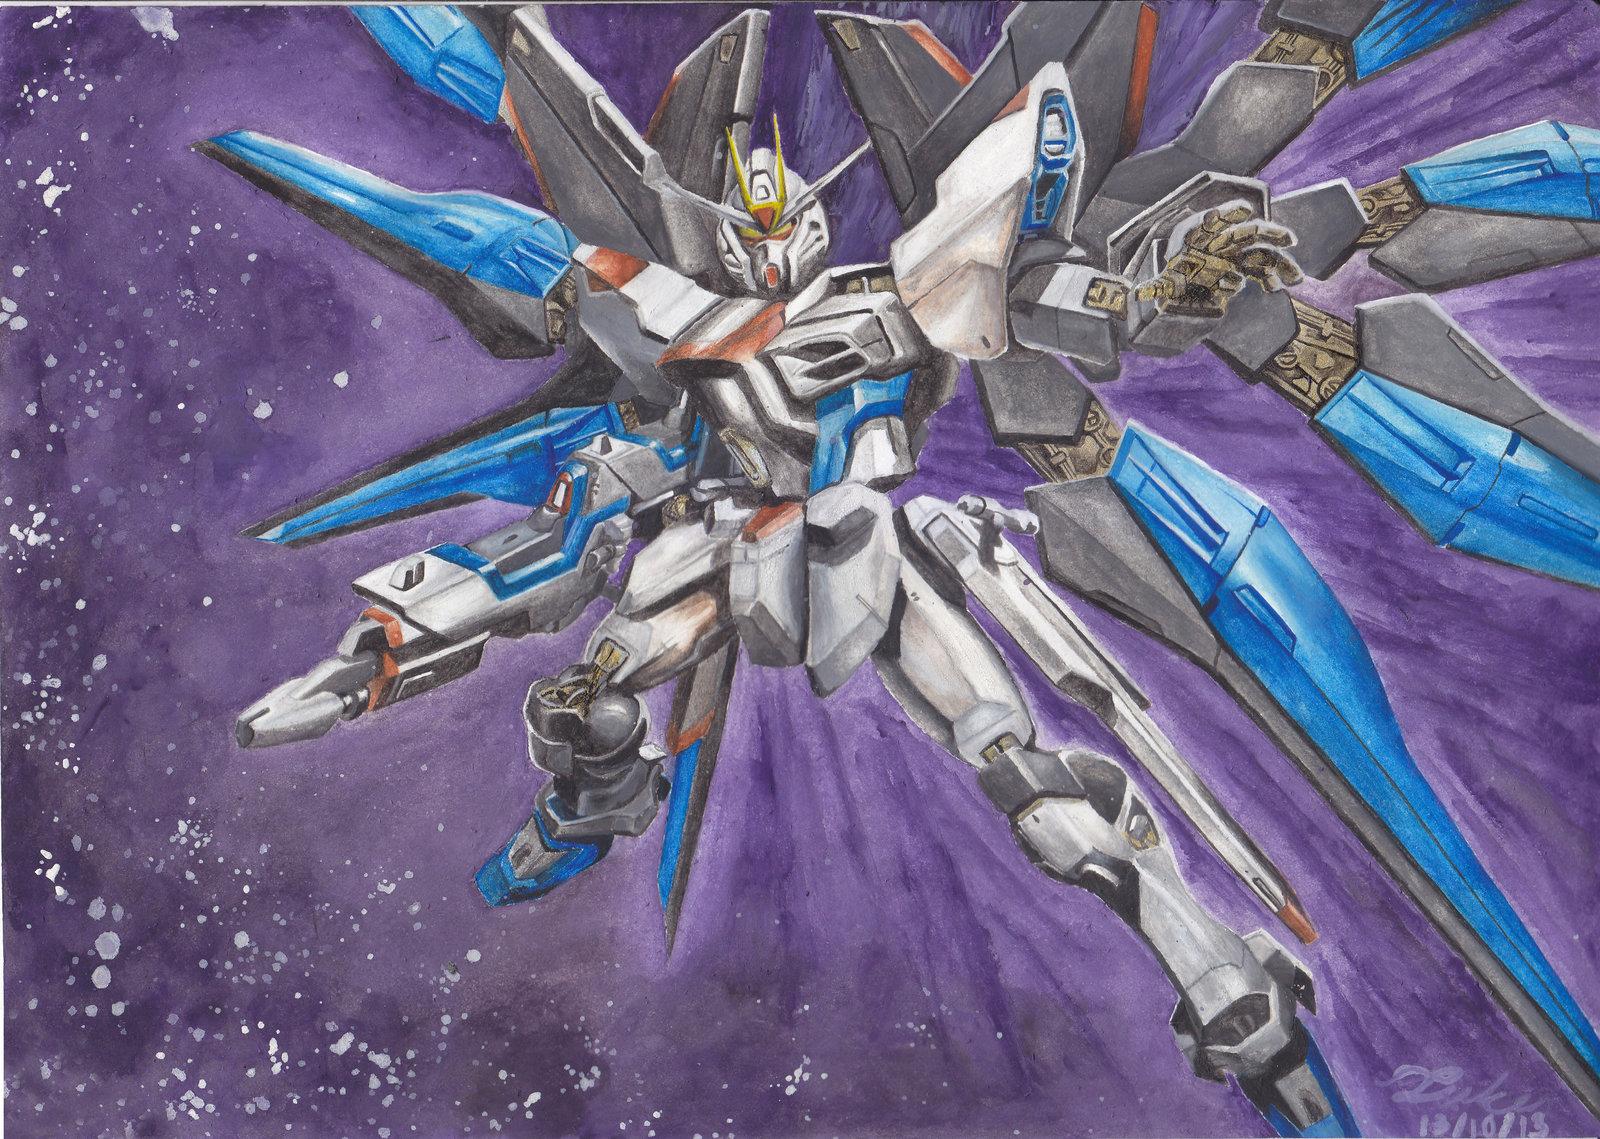 ZGMF X20A Strike Freedom Gundam by LukeLdh 1600x1139